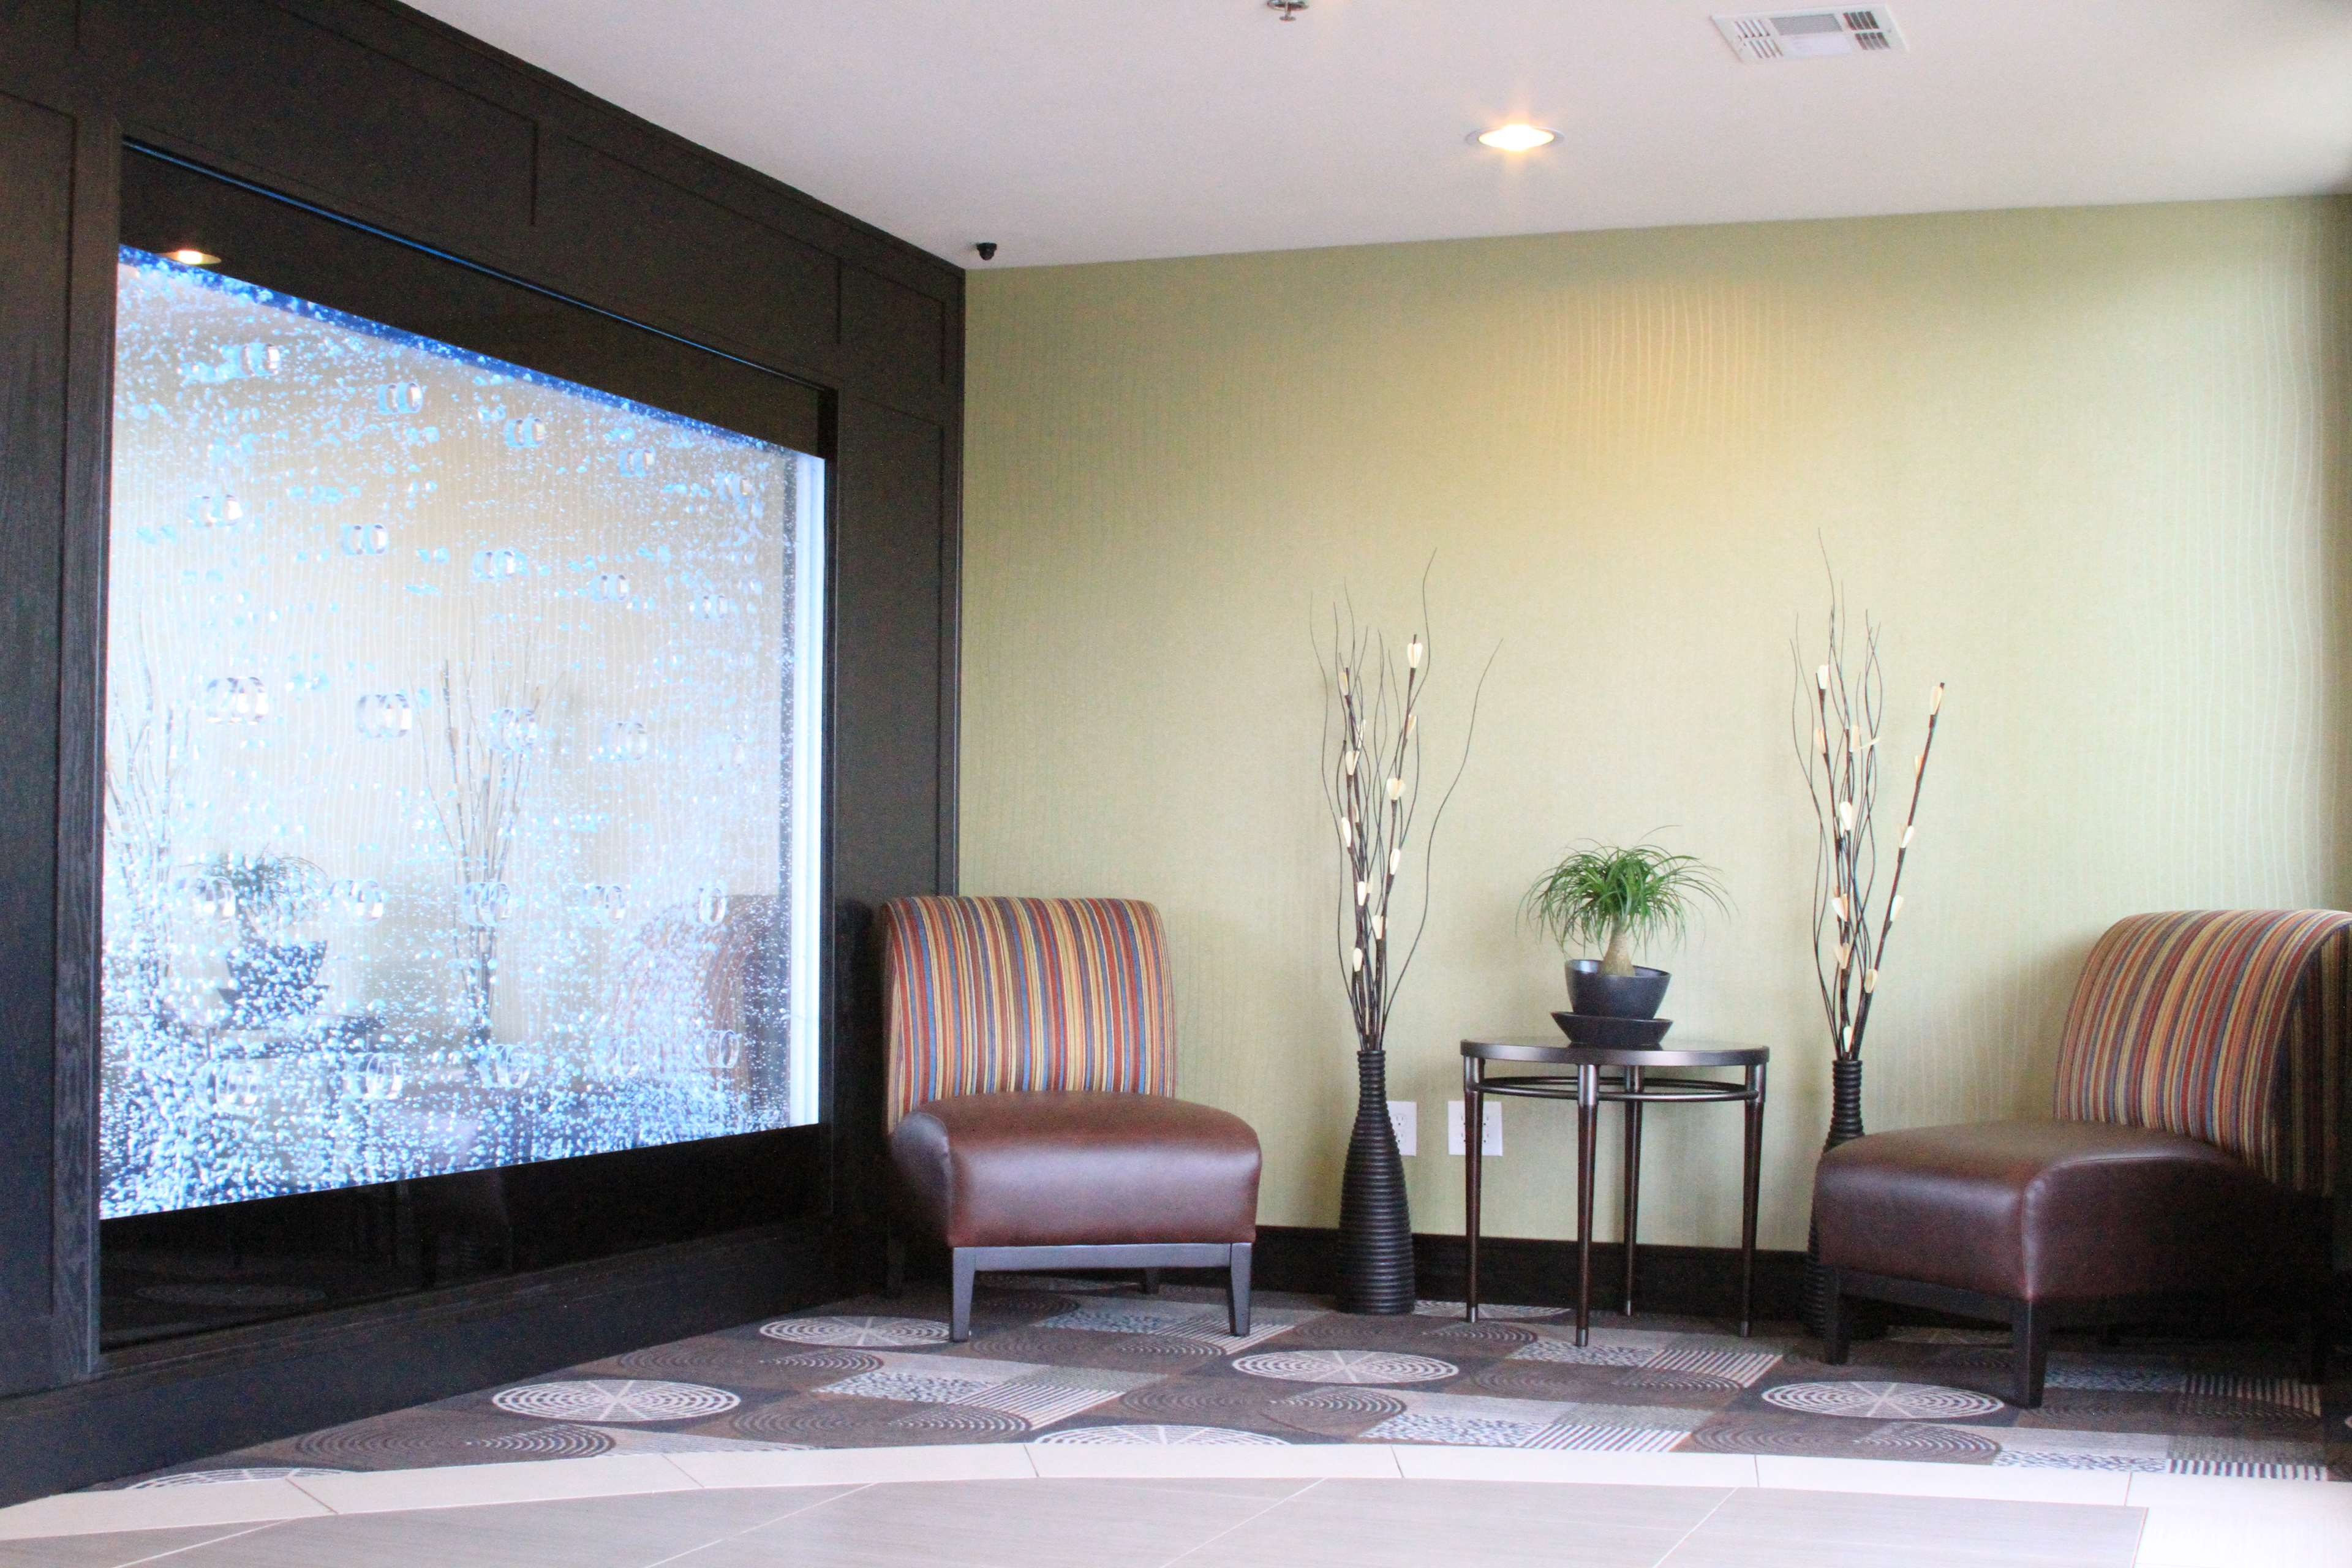 Best Western Plus Arlington North Hotel & Suites image 5